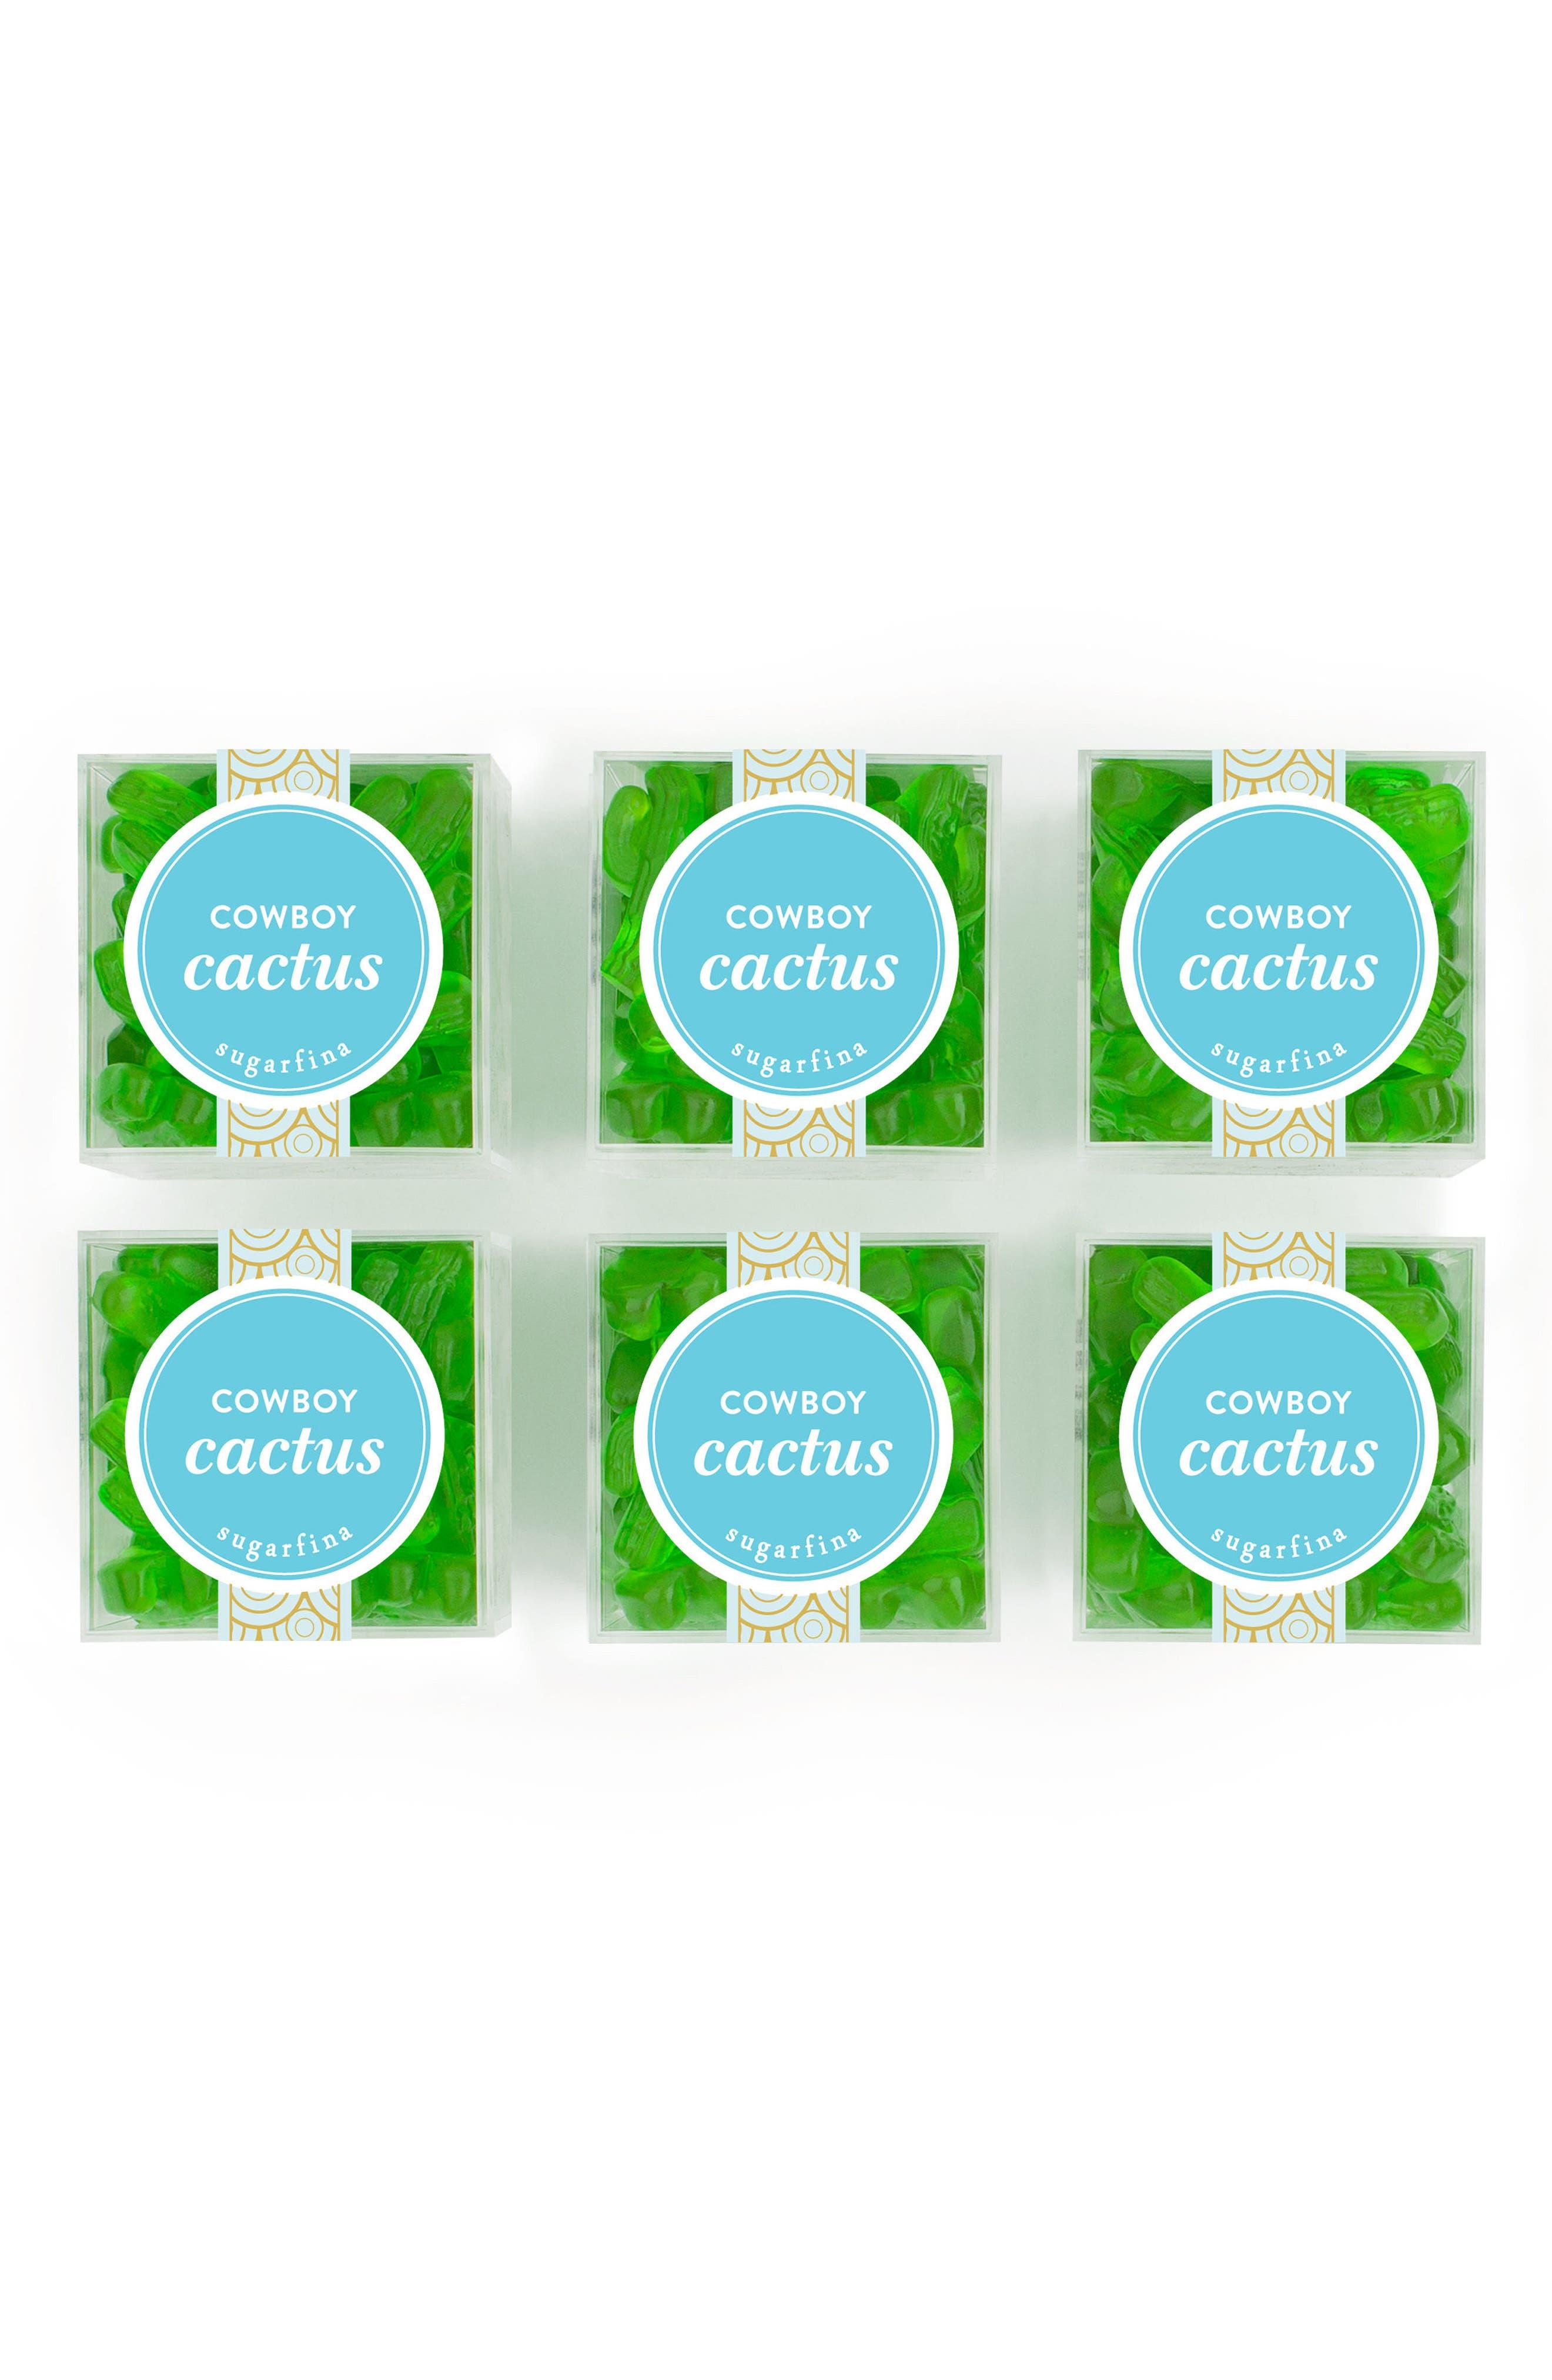 sugarfina Cowboy Cactus Set of 6 Candy Cubes